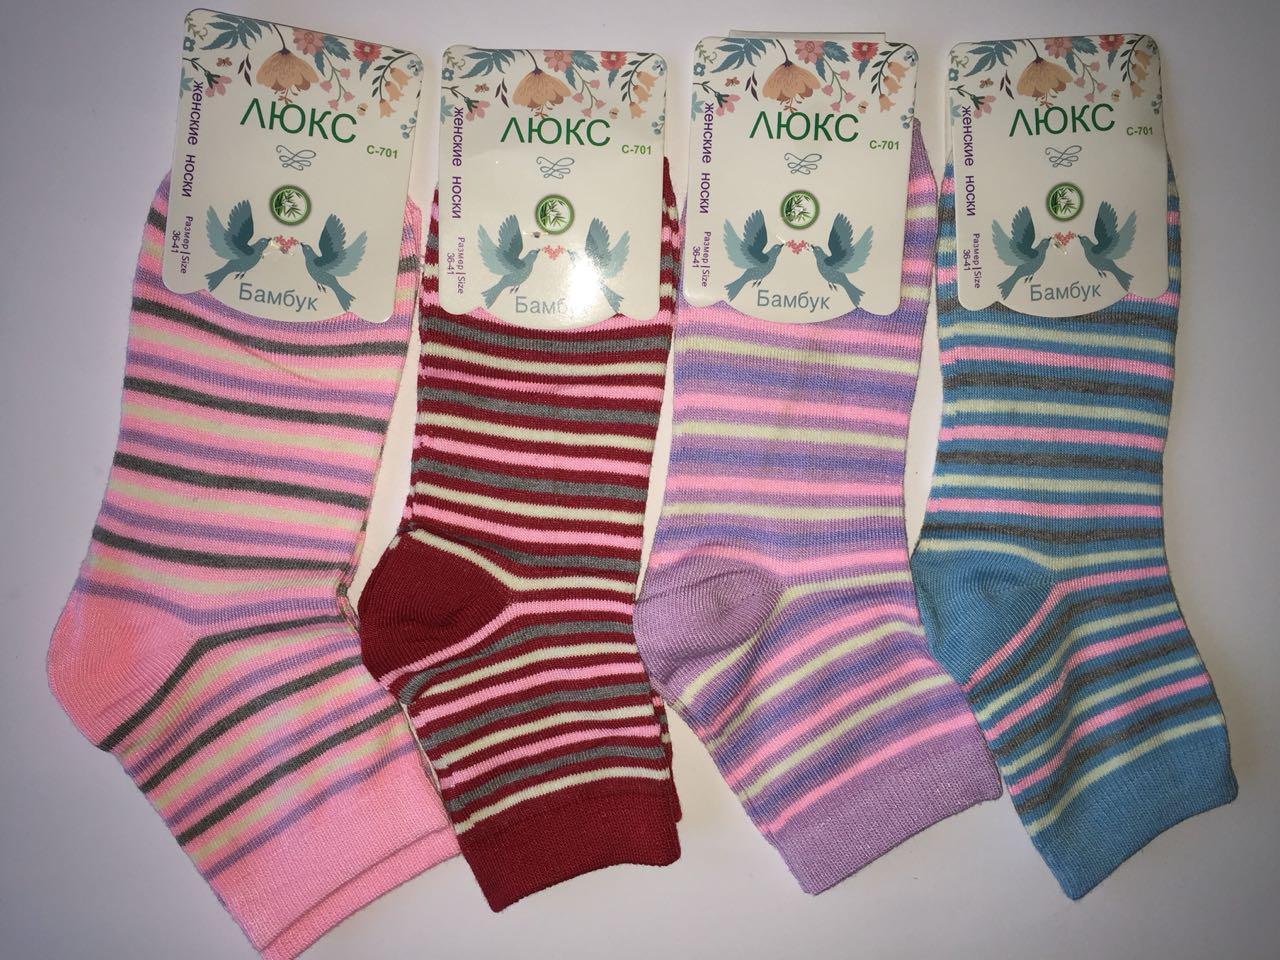 Женские носки 36-41 люкс бамбук